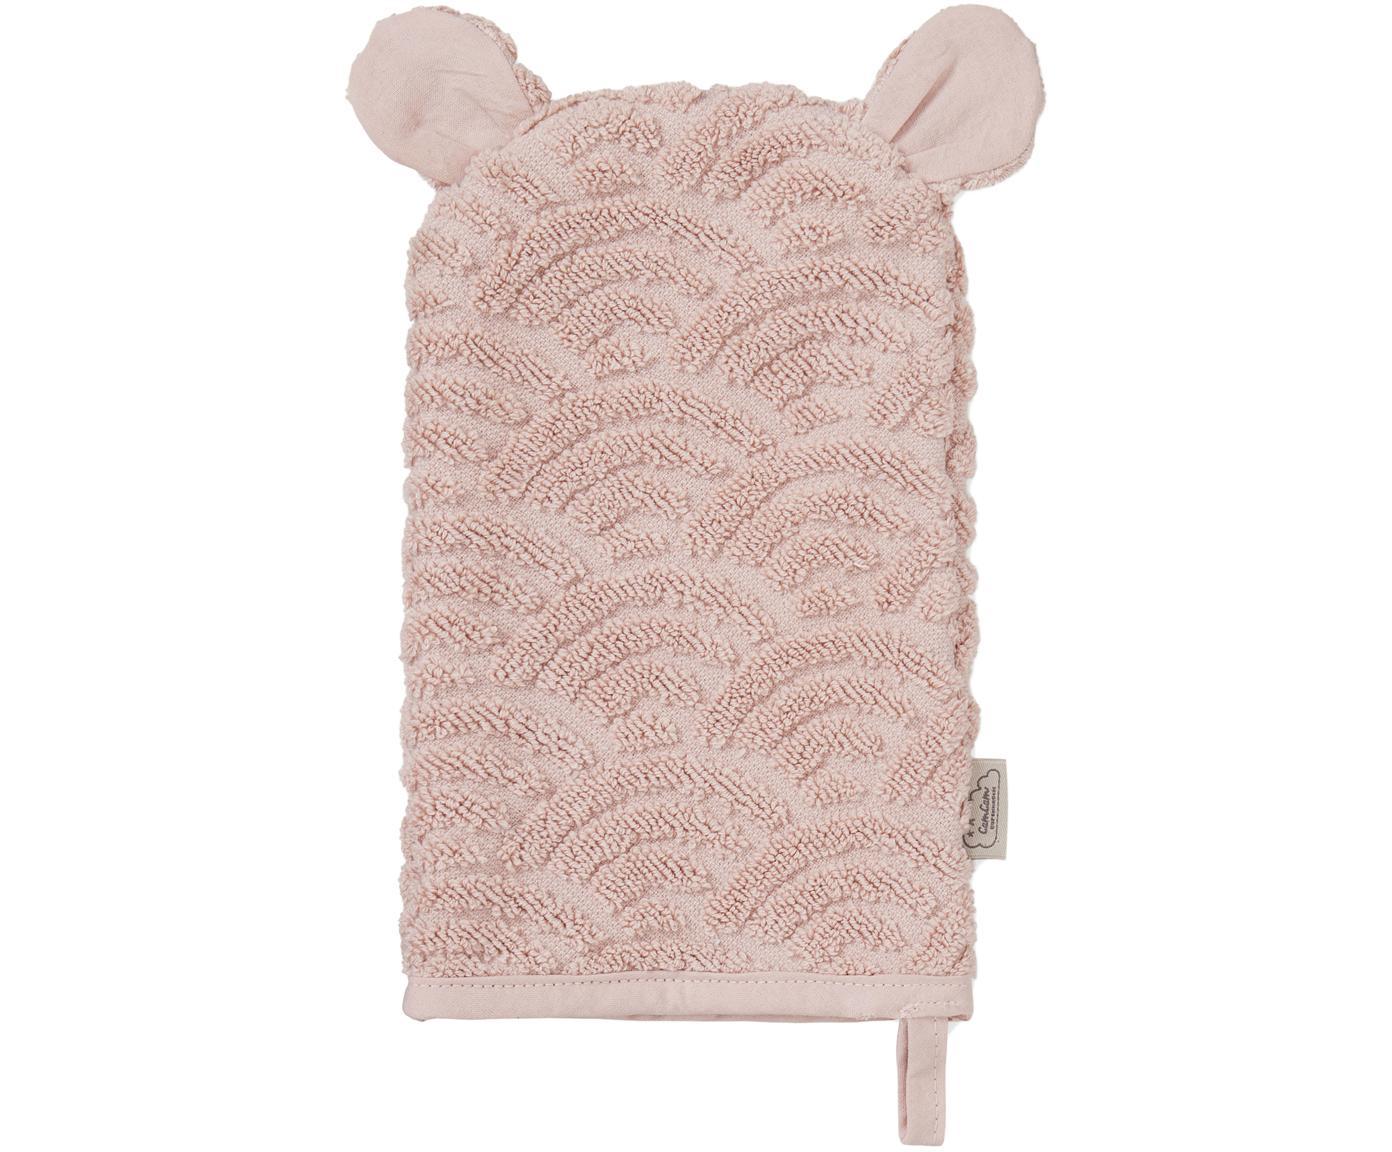 Manopla de baño de algodón ecológico Wave, Algodón orgánico, Rosa, An 15 x L 22 cm